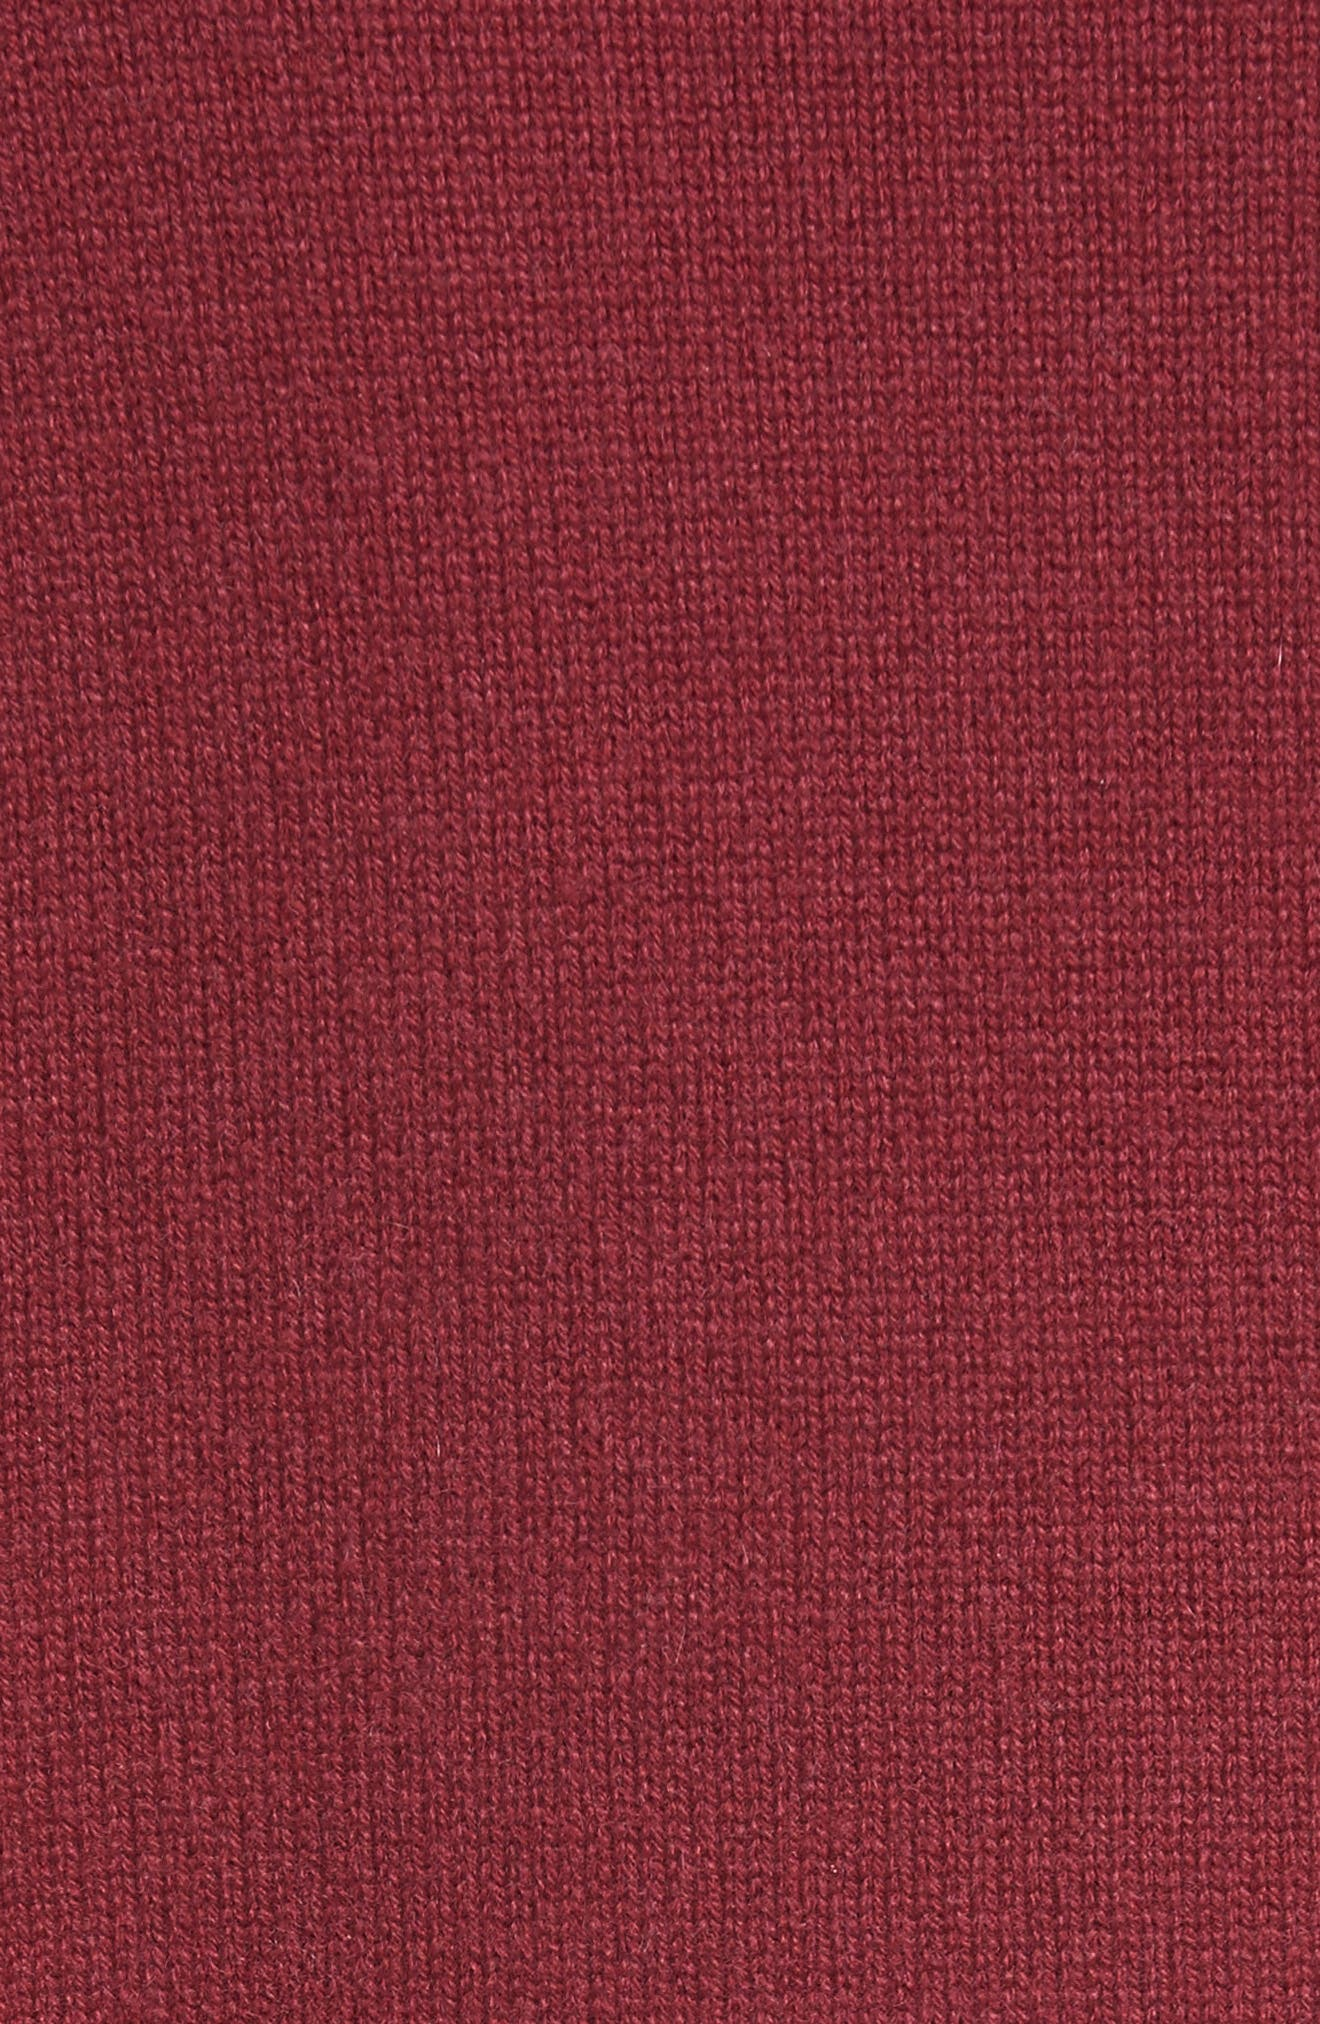 Cashmere Turtleneck Sweater,                             Alternate thumbnail 5, color,                             Cherry